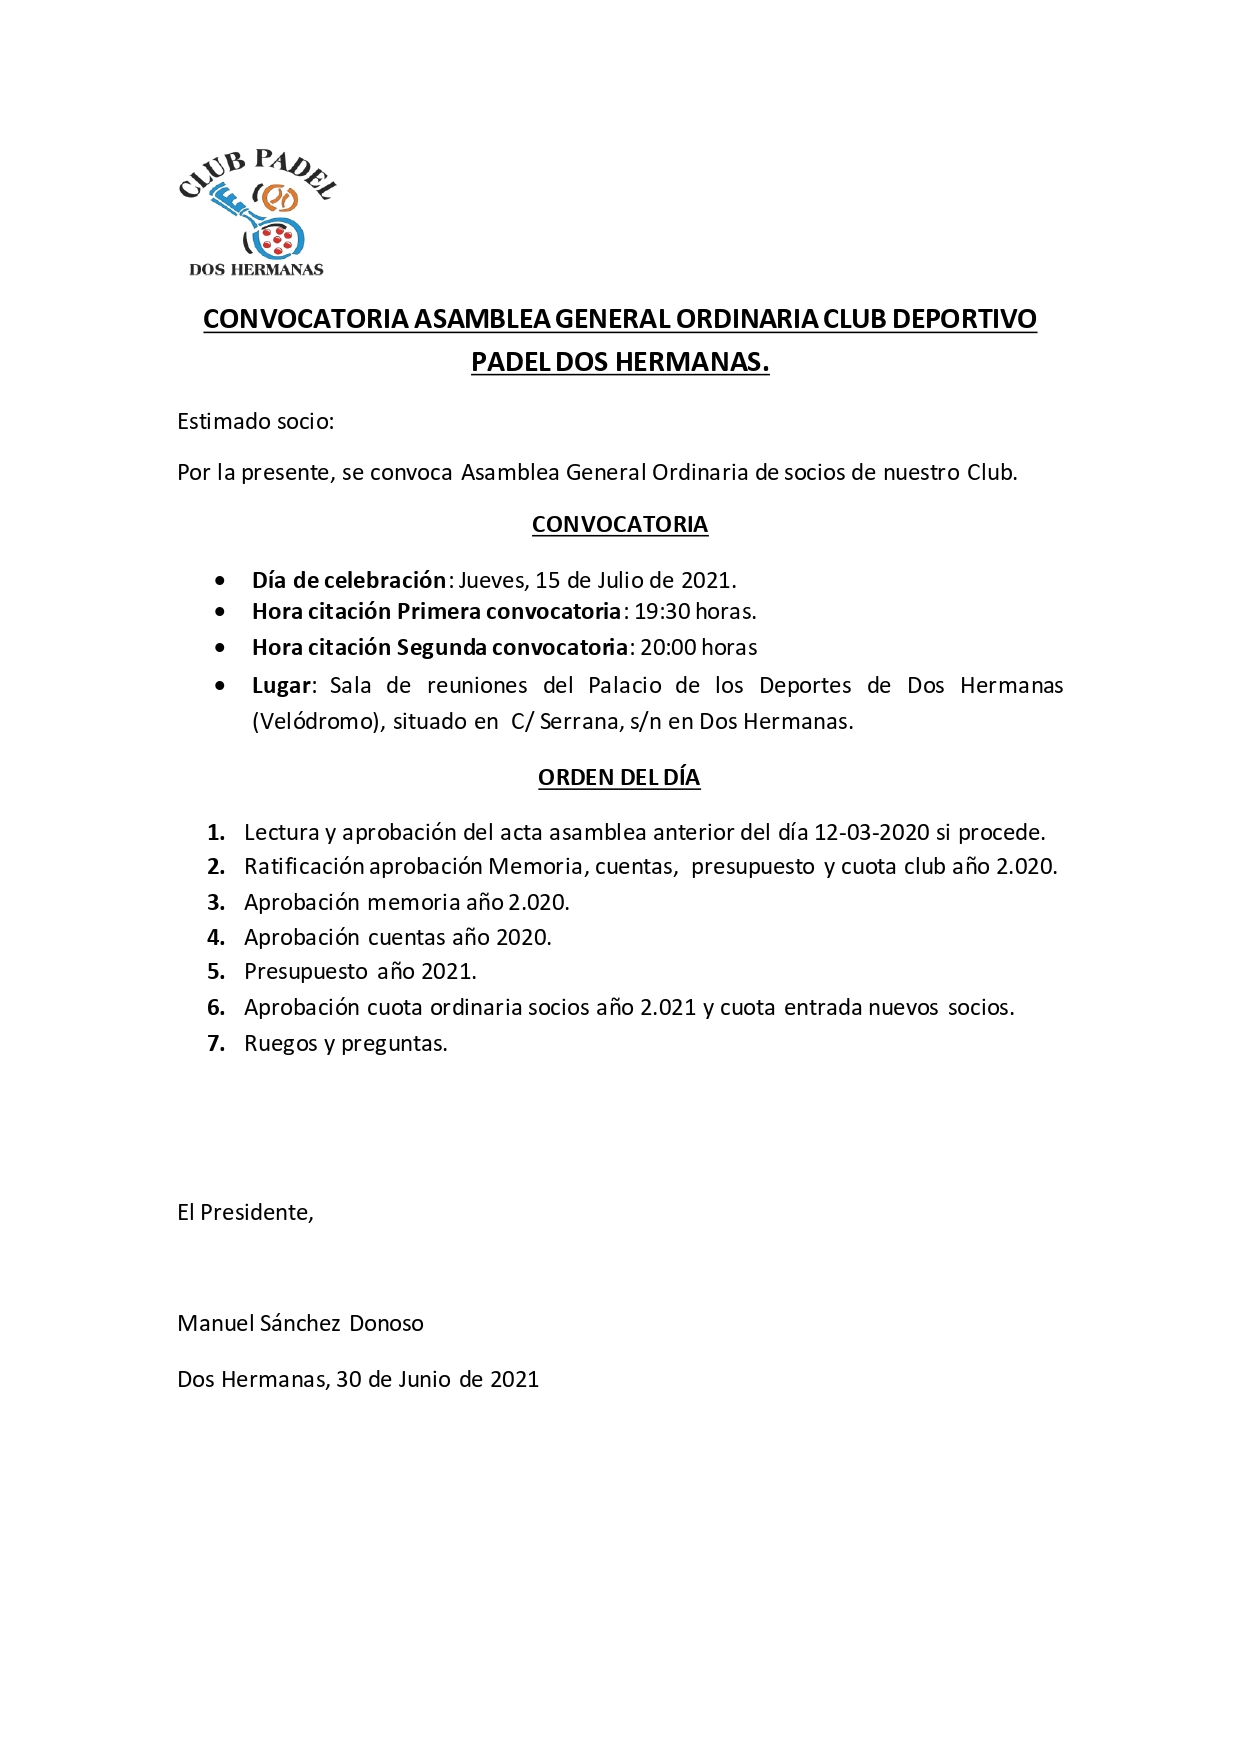 ASAMBLEA GENERAL ORDINARIA 15-07-2021